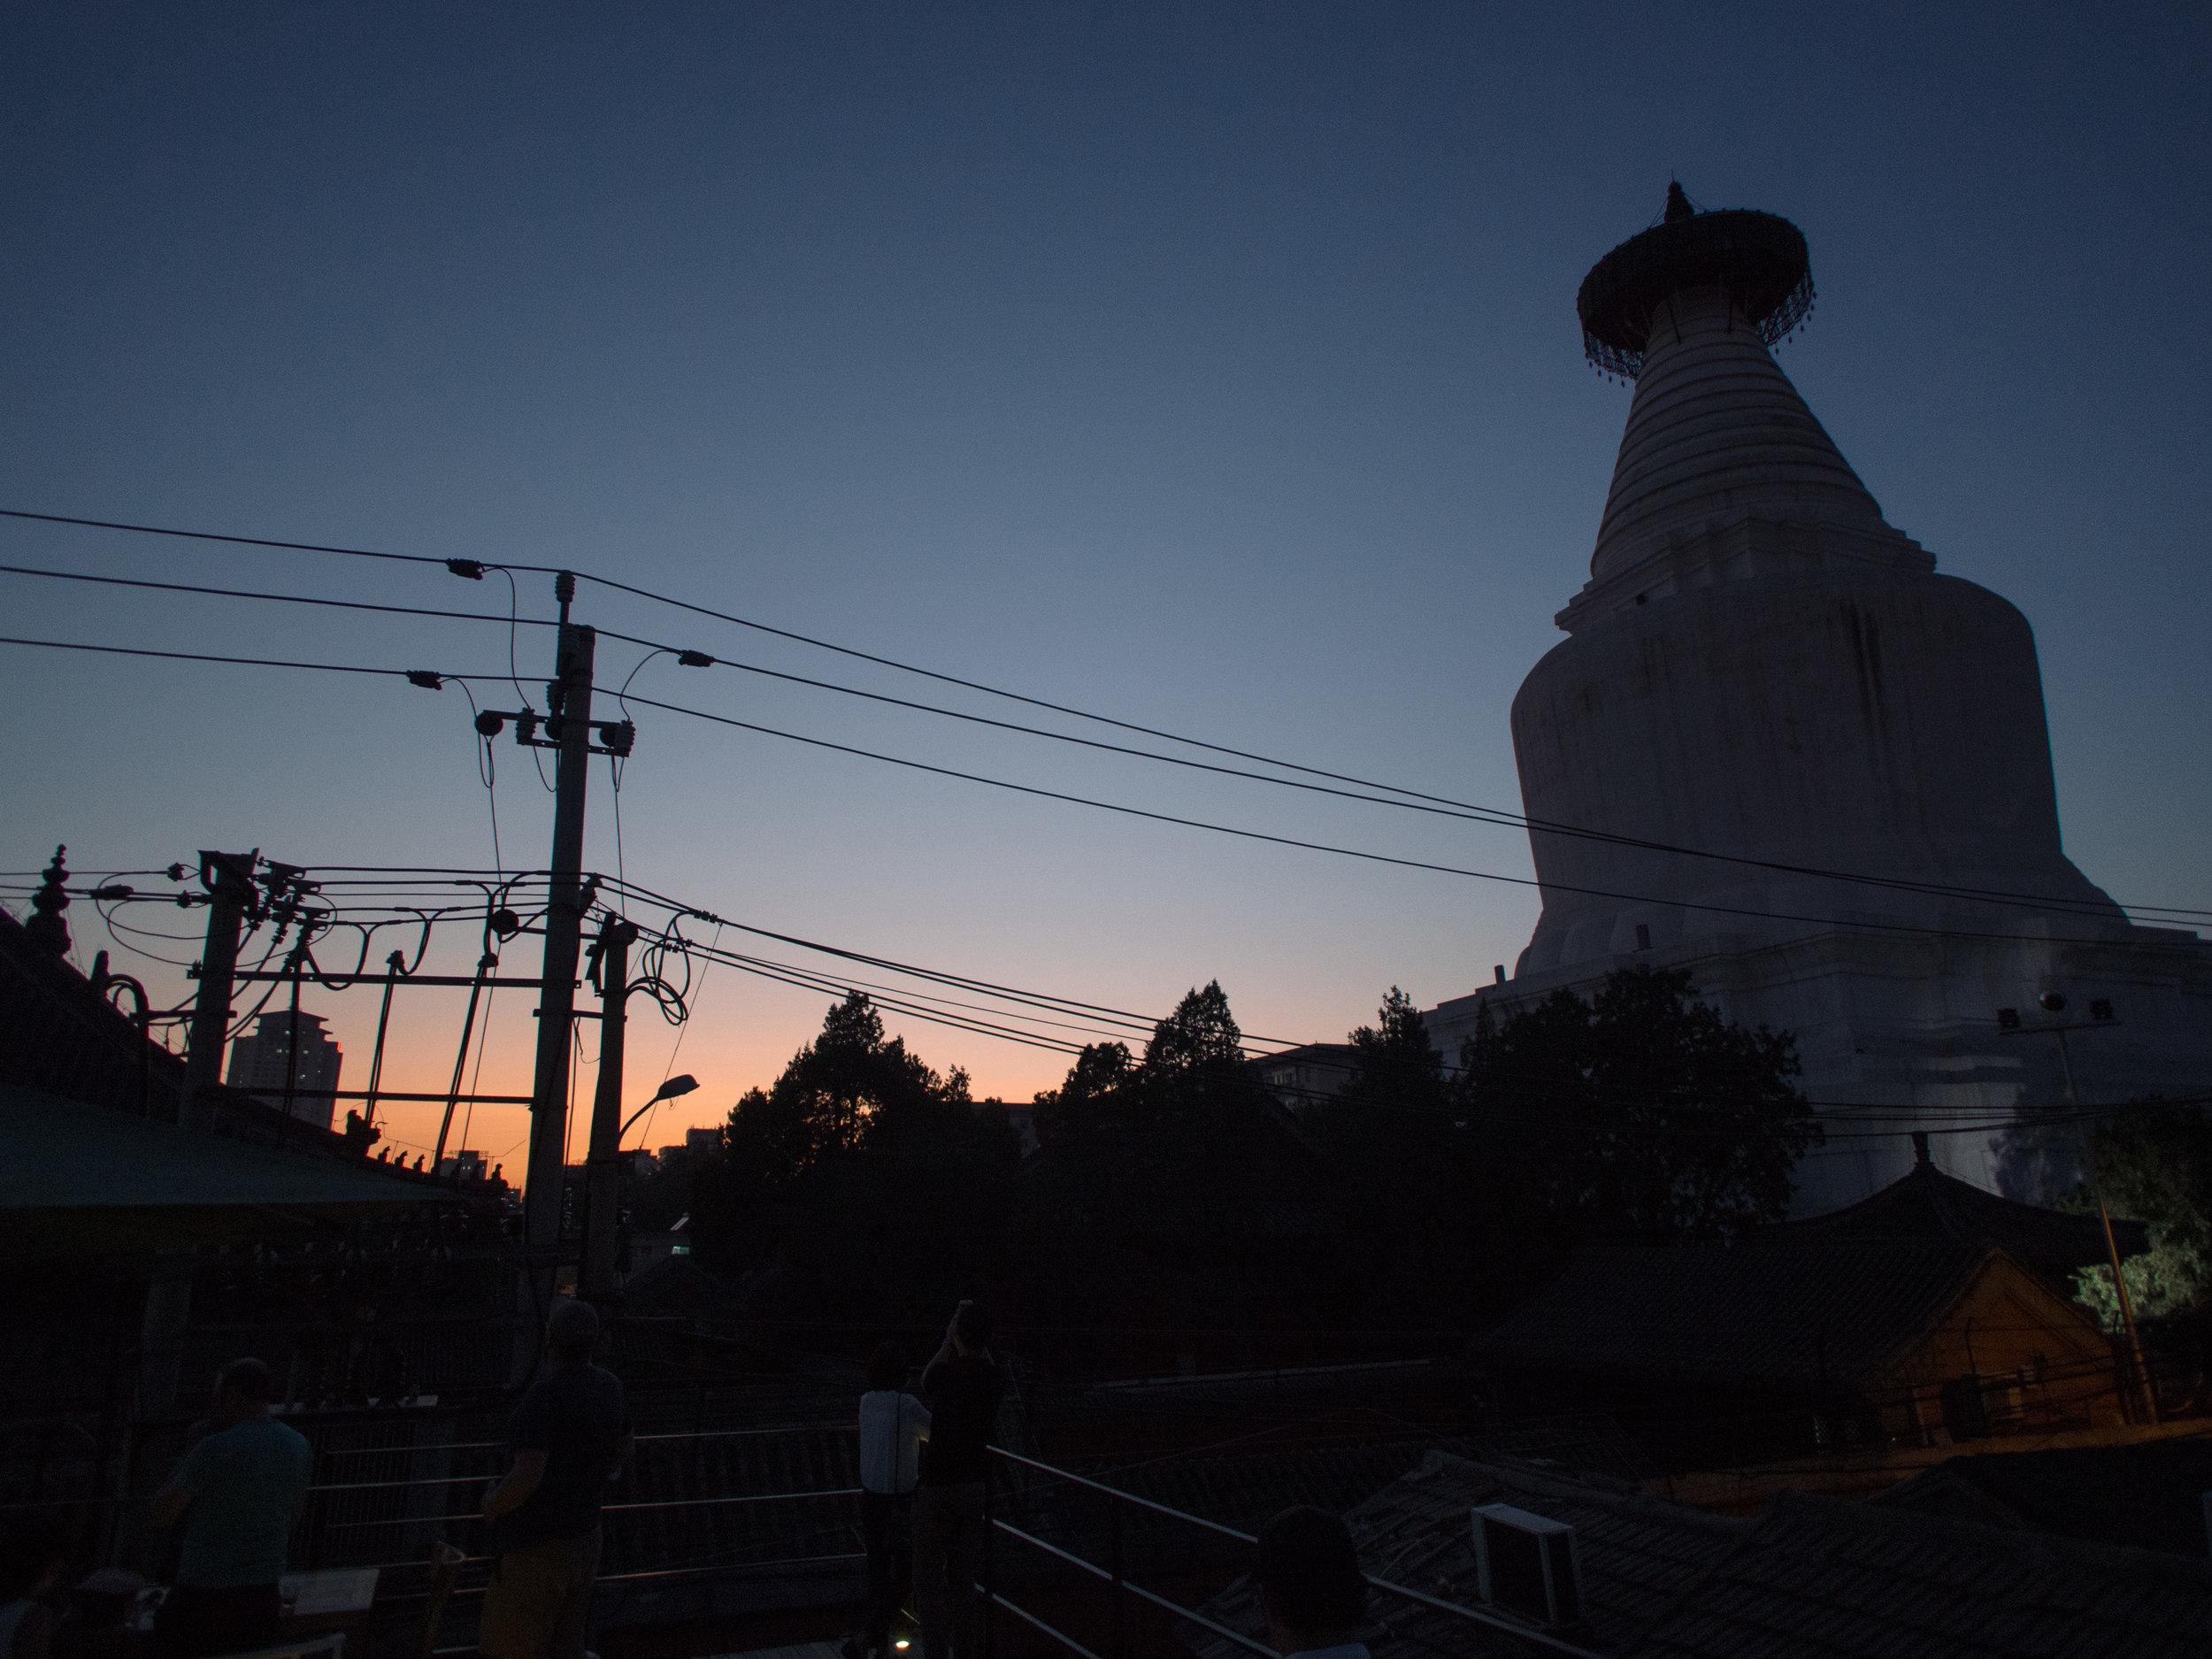 Beijing's White Cloud Pagoda (Baitasi) at dusk.